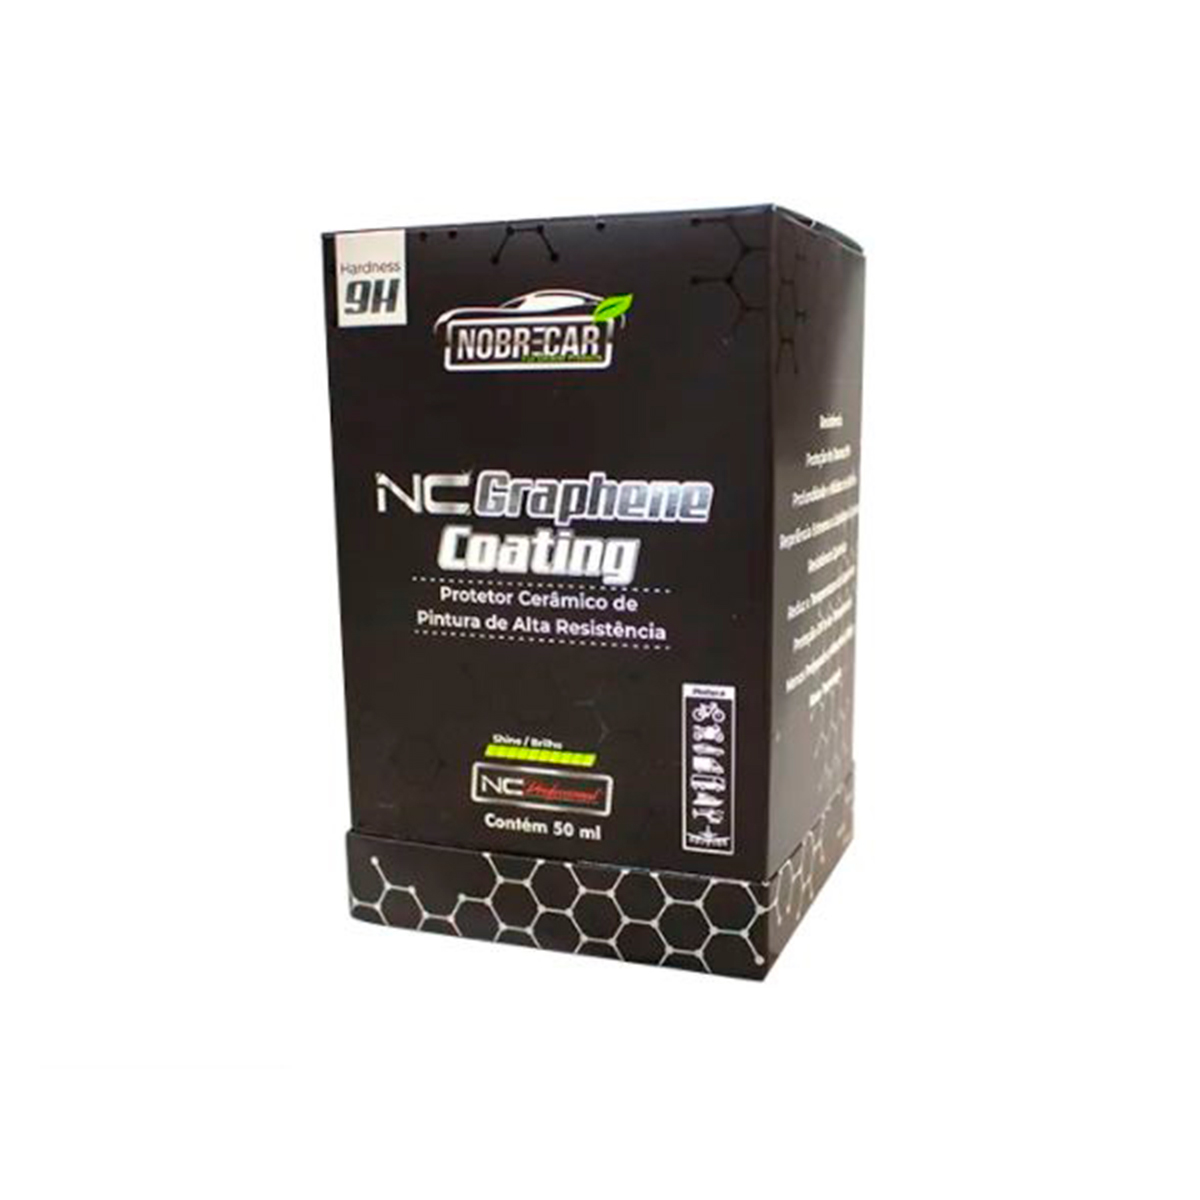 NC Graphene Coating 9H Protetor Cerâmico 50ml - Nobrecar